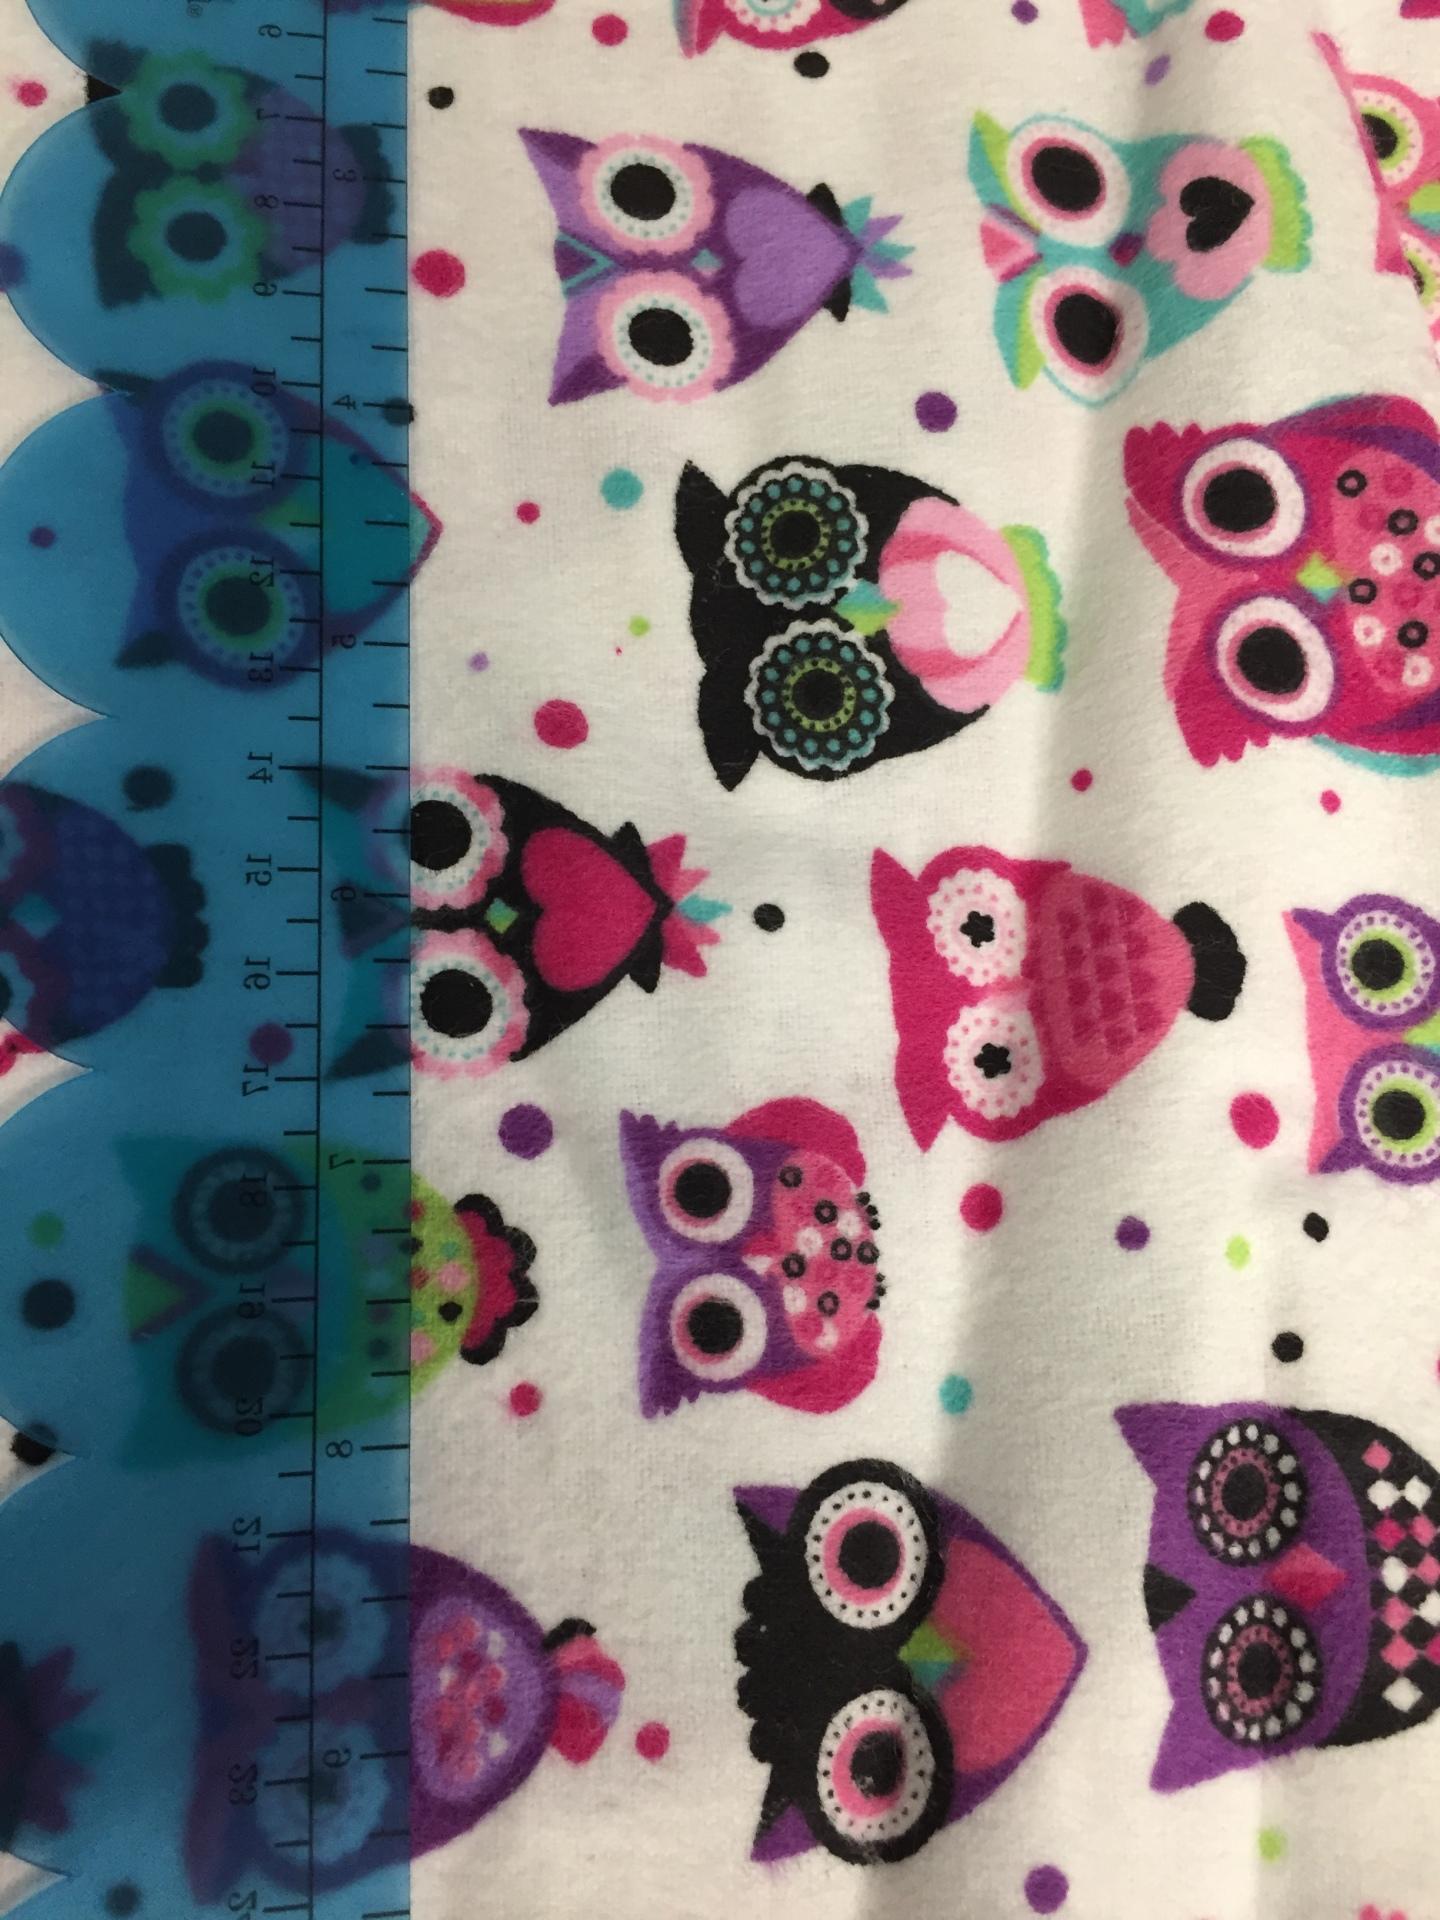 044 Owl Cuties - Flannel